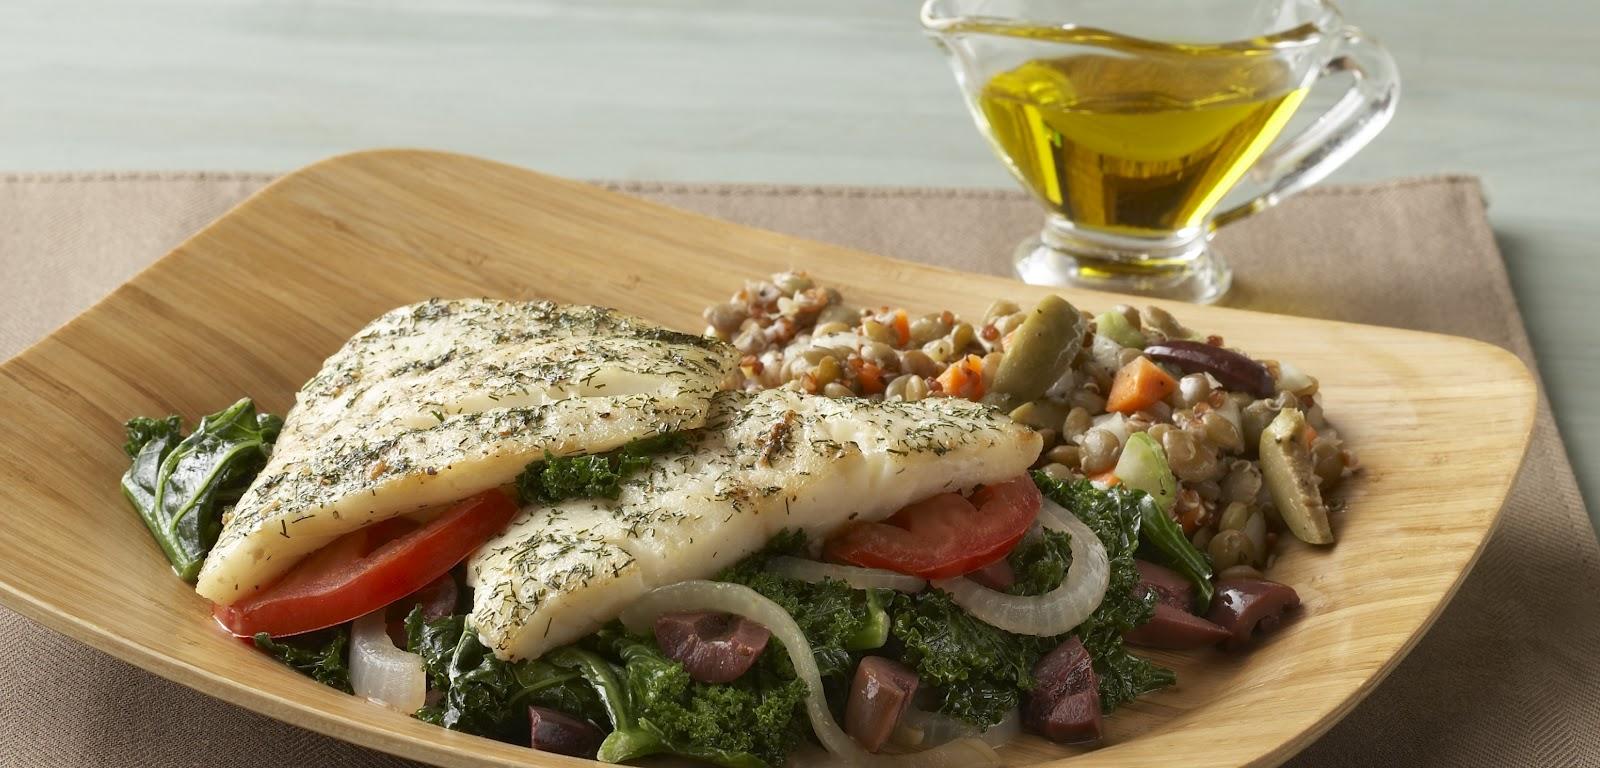 Sauteed Cod With Lentils Recipes — Dishmaps